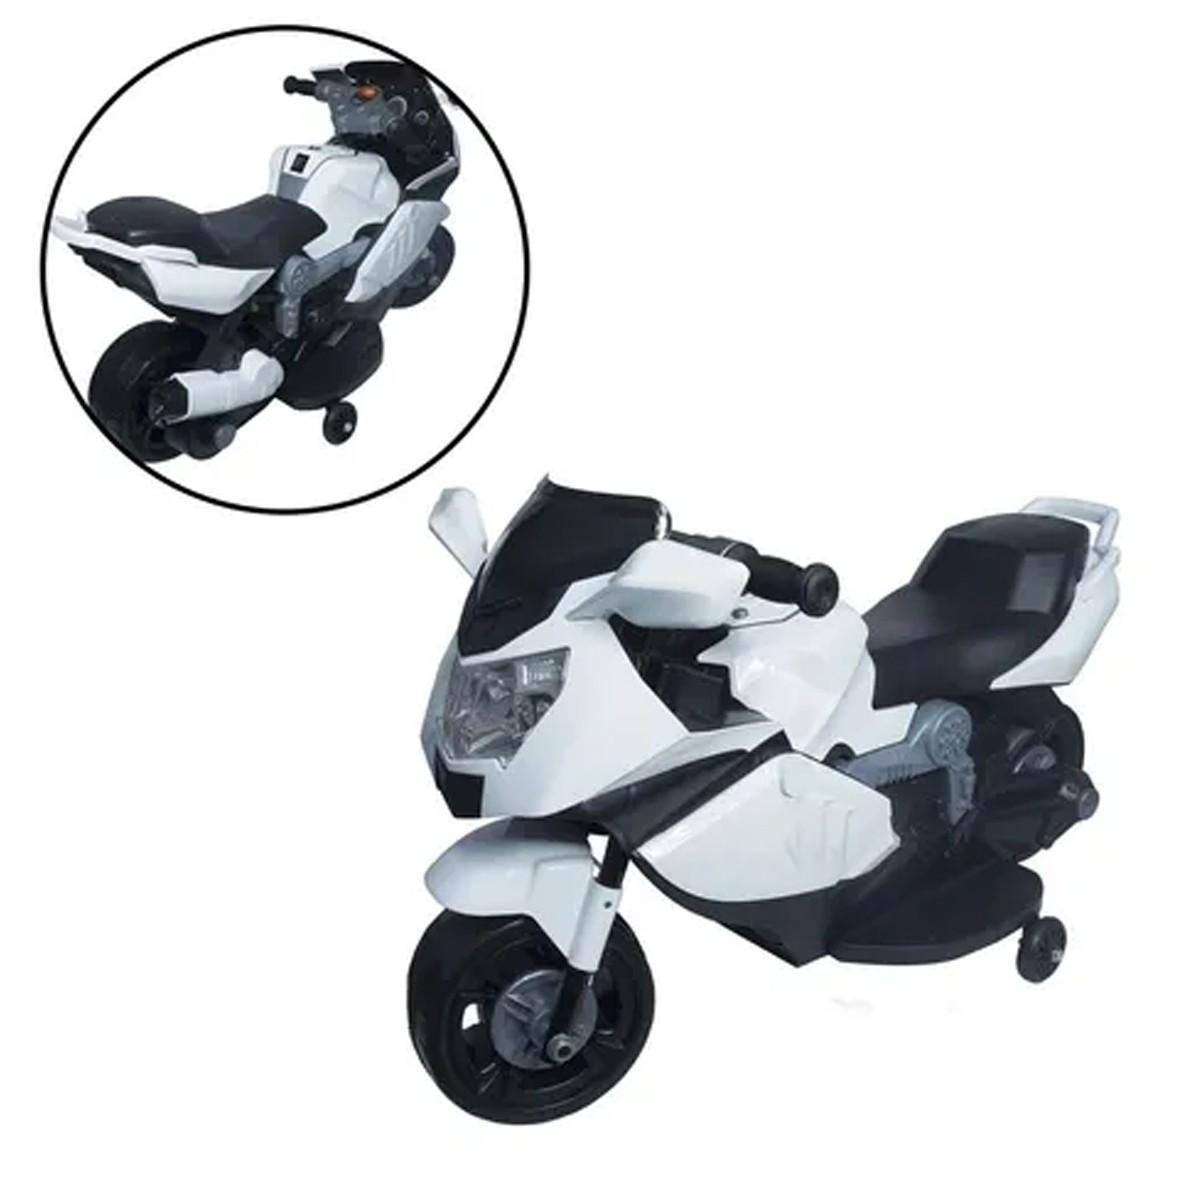 Mini Moto Elétrica Infantil Branca Importway